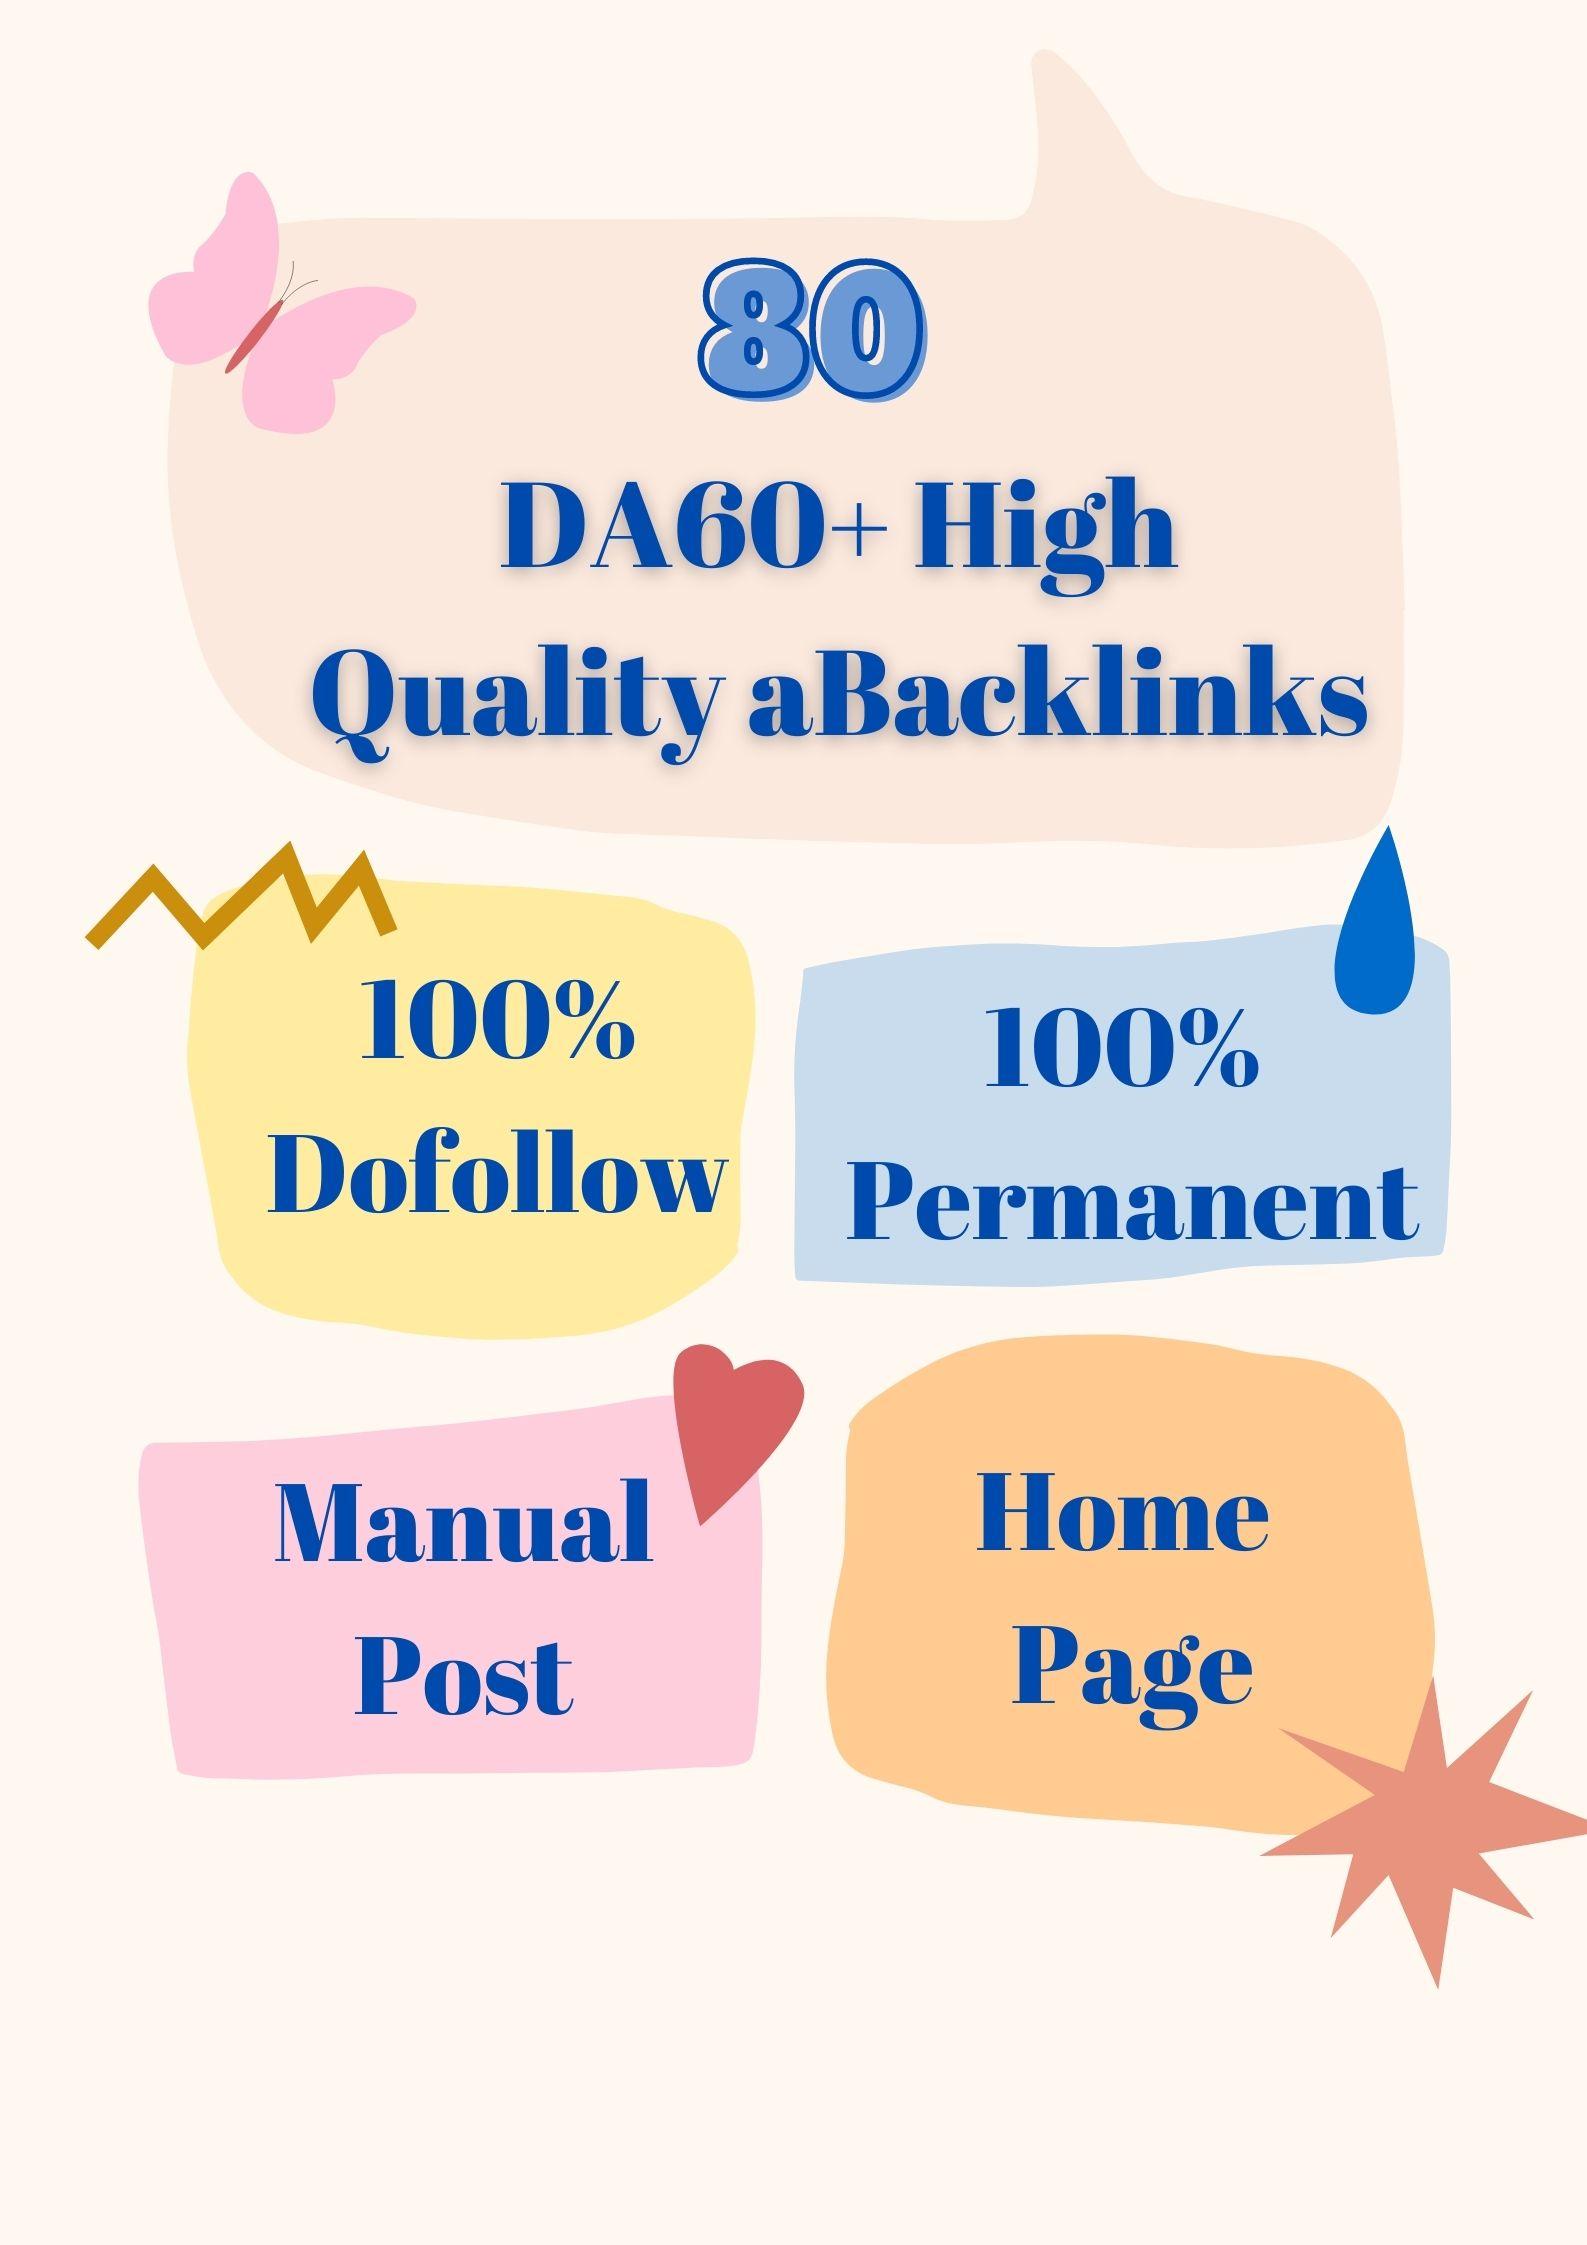 Get 80 High Quality DA60+ Permanent HomePage PBN Links